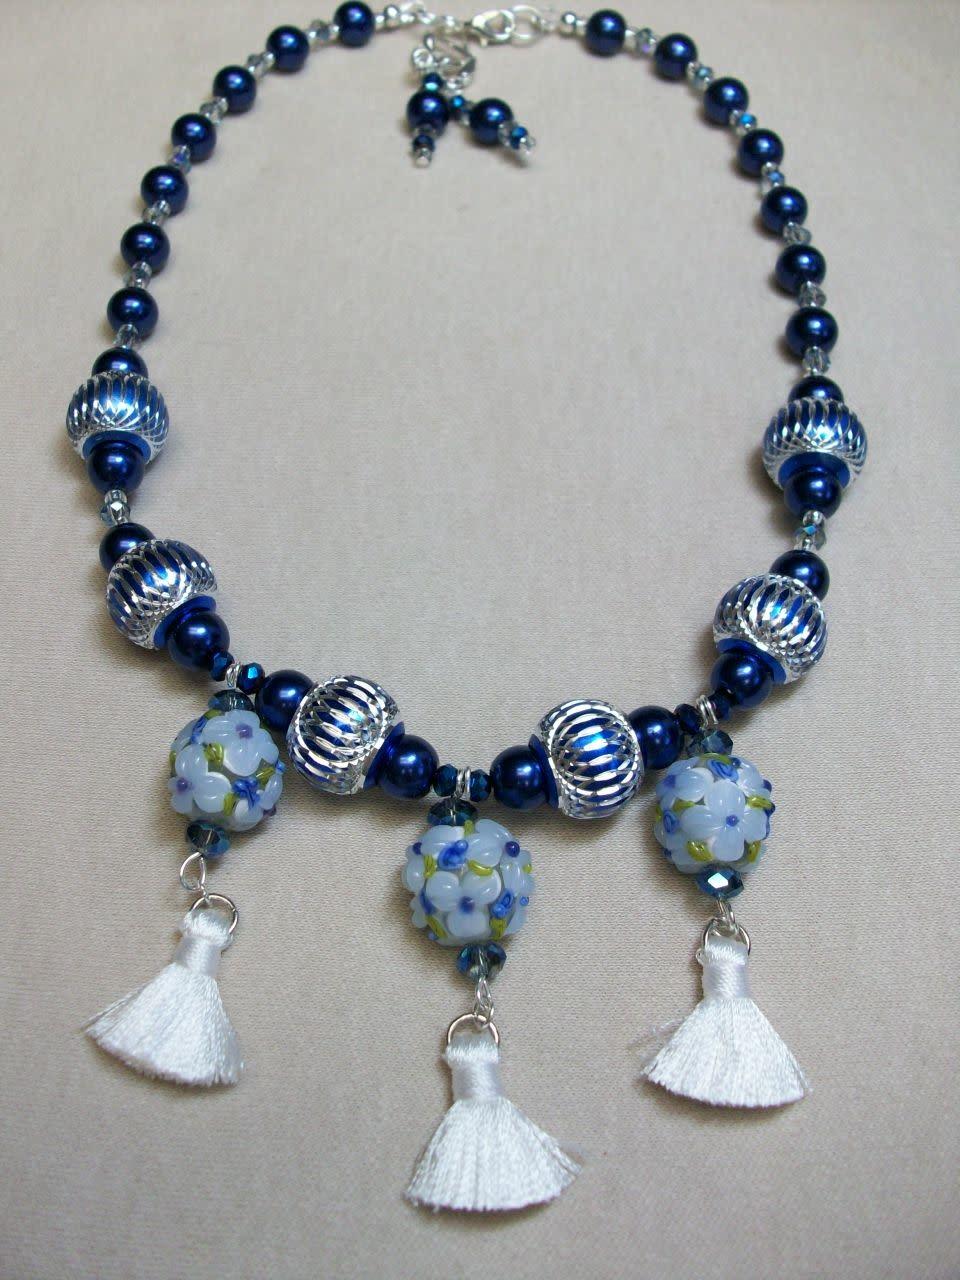 Sharon B's Originals 3 Blue & White Round Beads w/ White Silk Tassels Necklace & Earring Set